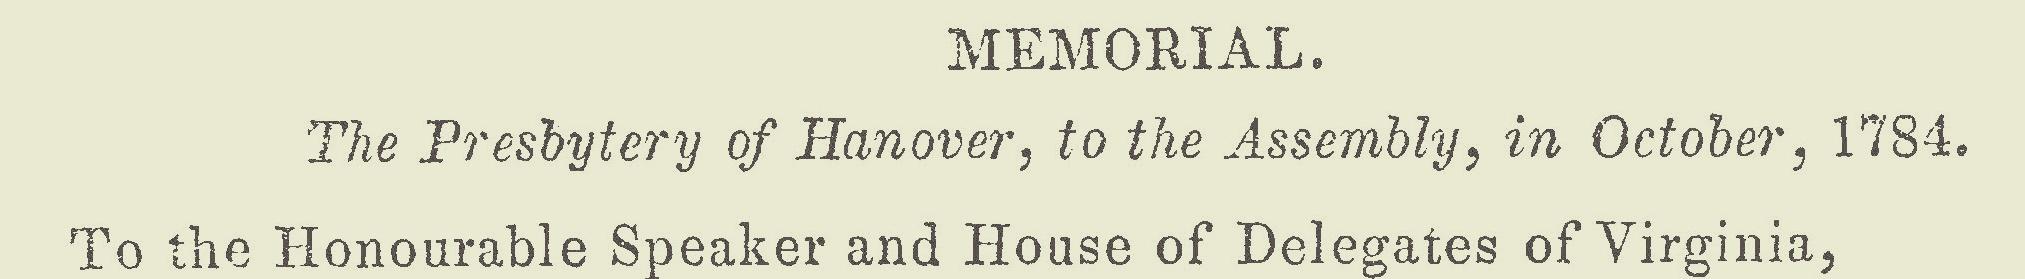 Smith, John Blair, October 1784 Memorial Petition Title Page.jpg